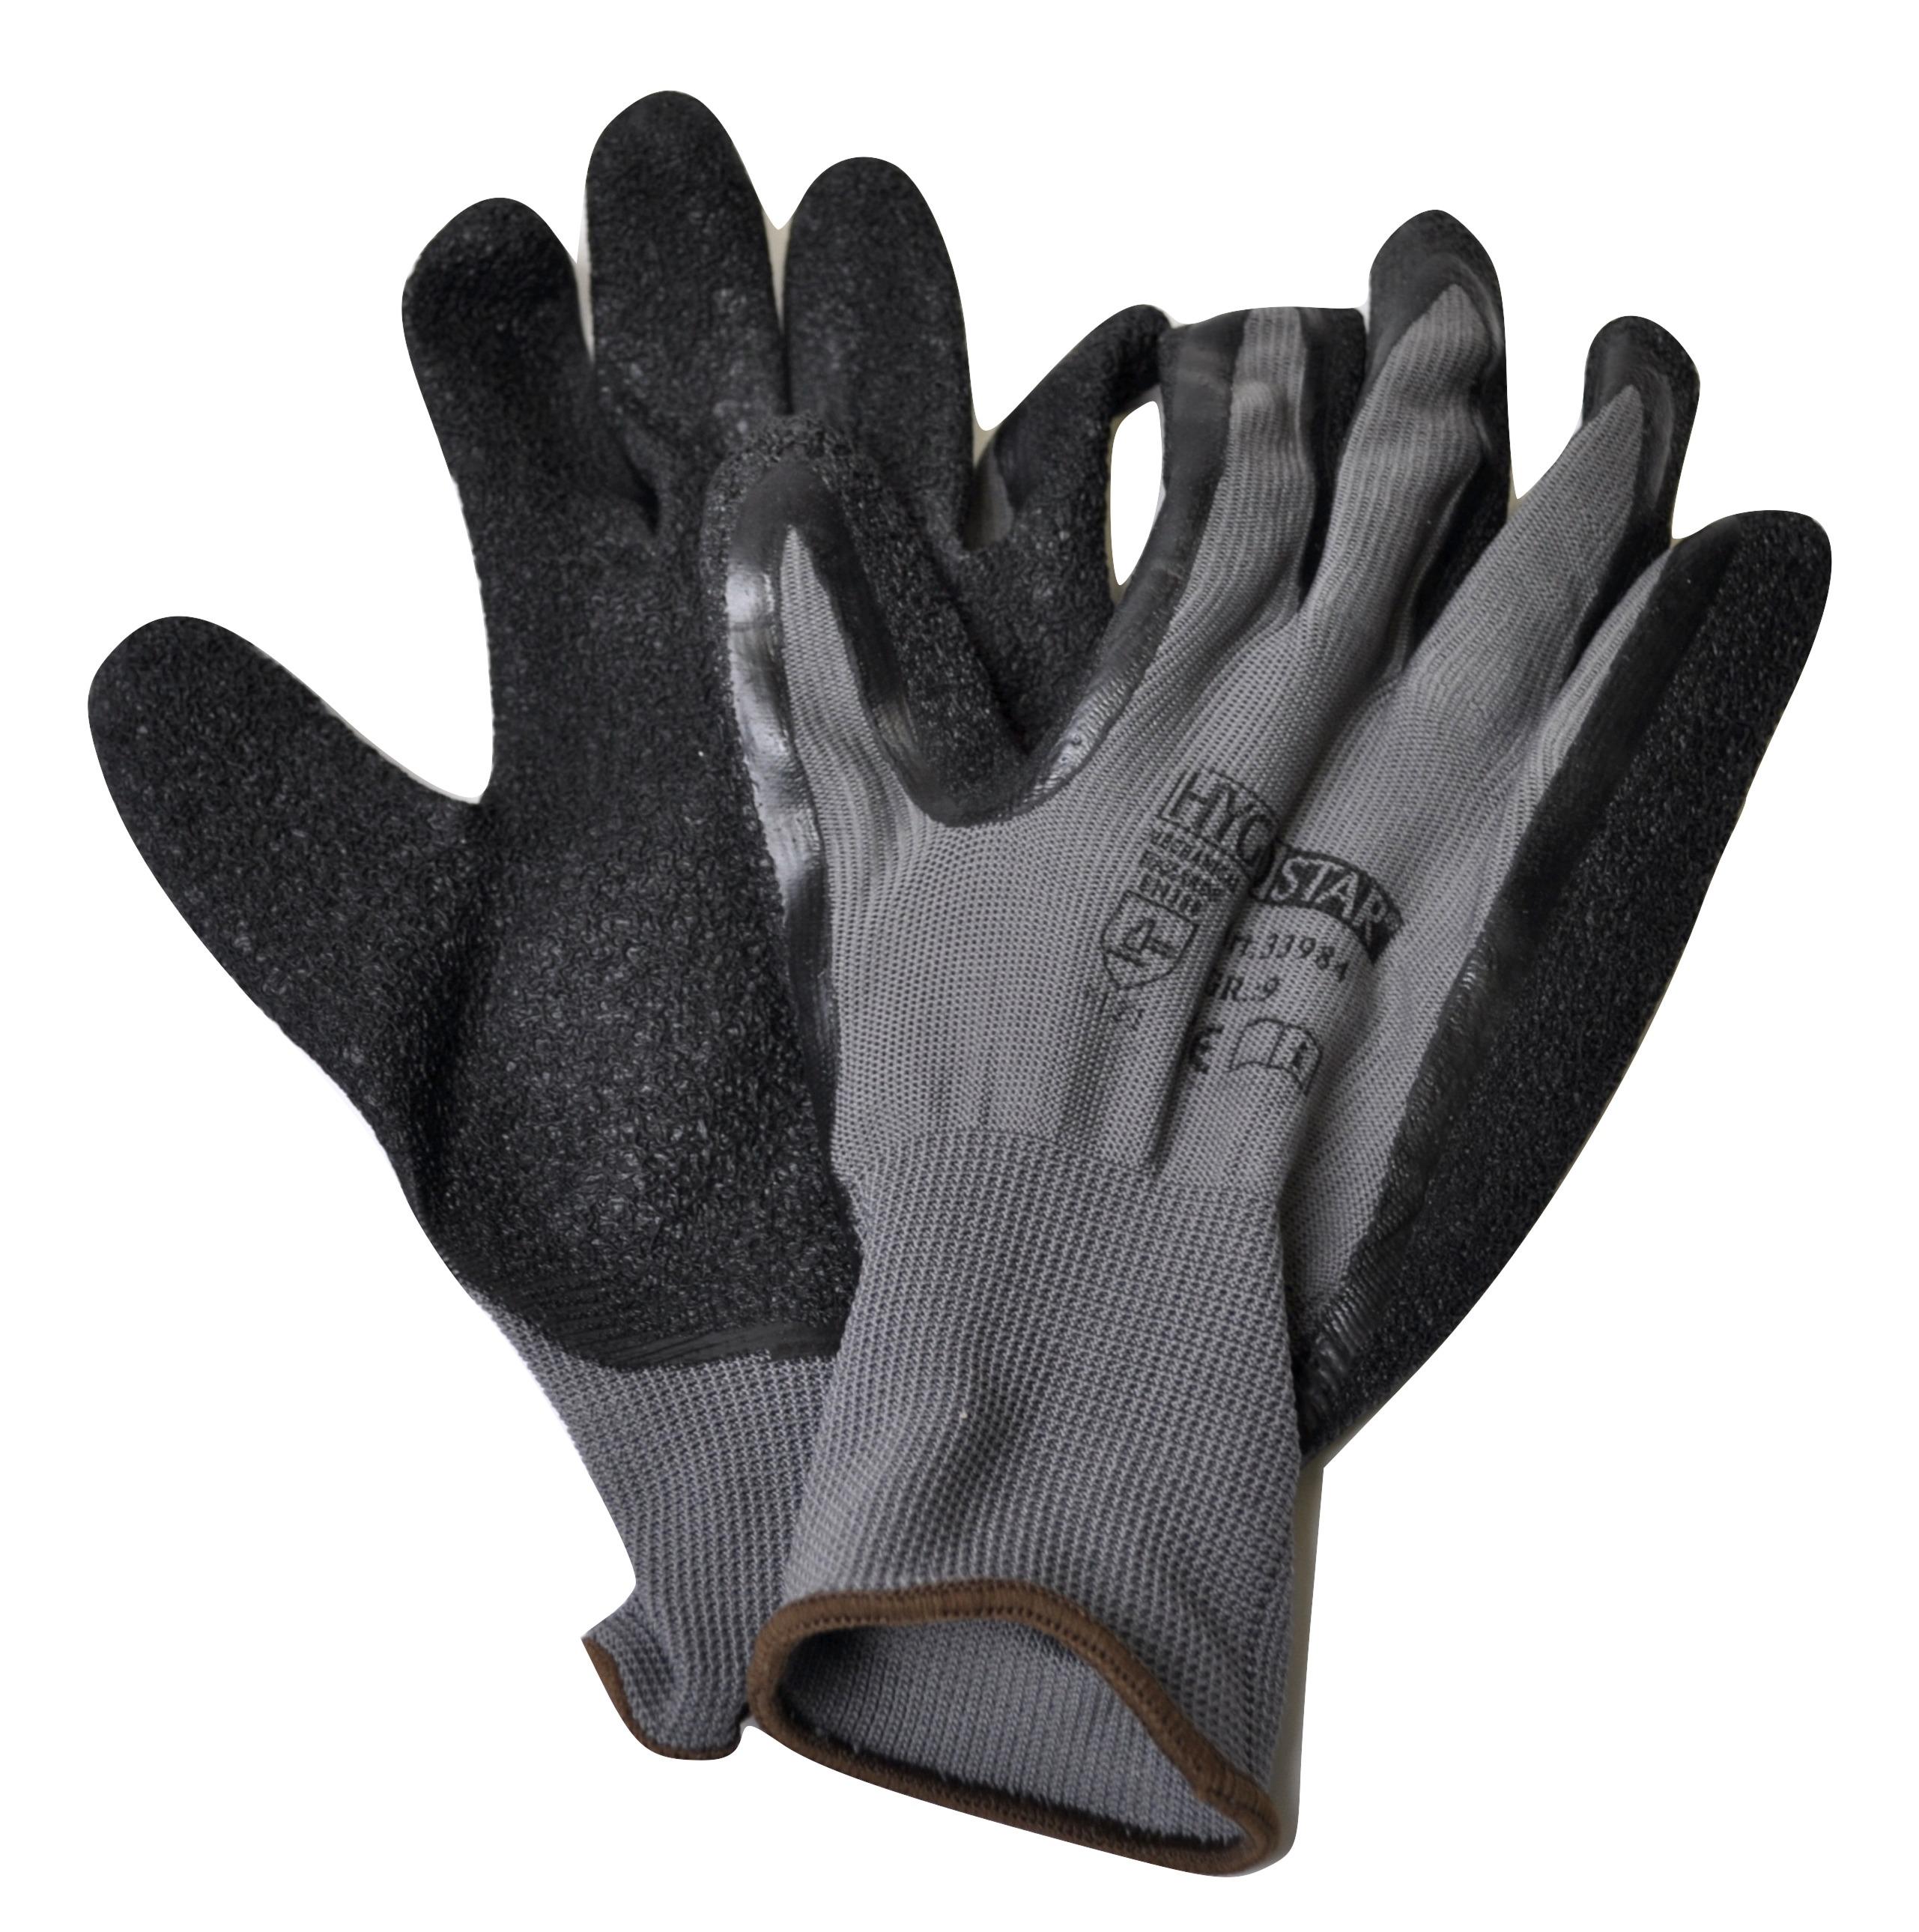 12 Paar Handschuhe SKILL grau Nylon-Feinstrick mit Latexbeschichtung - Größe L